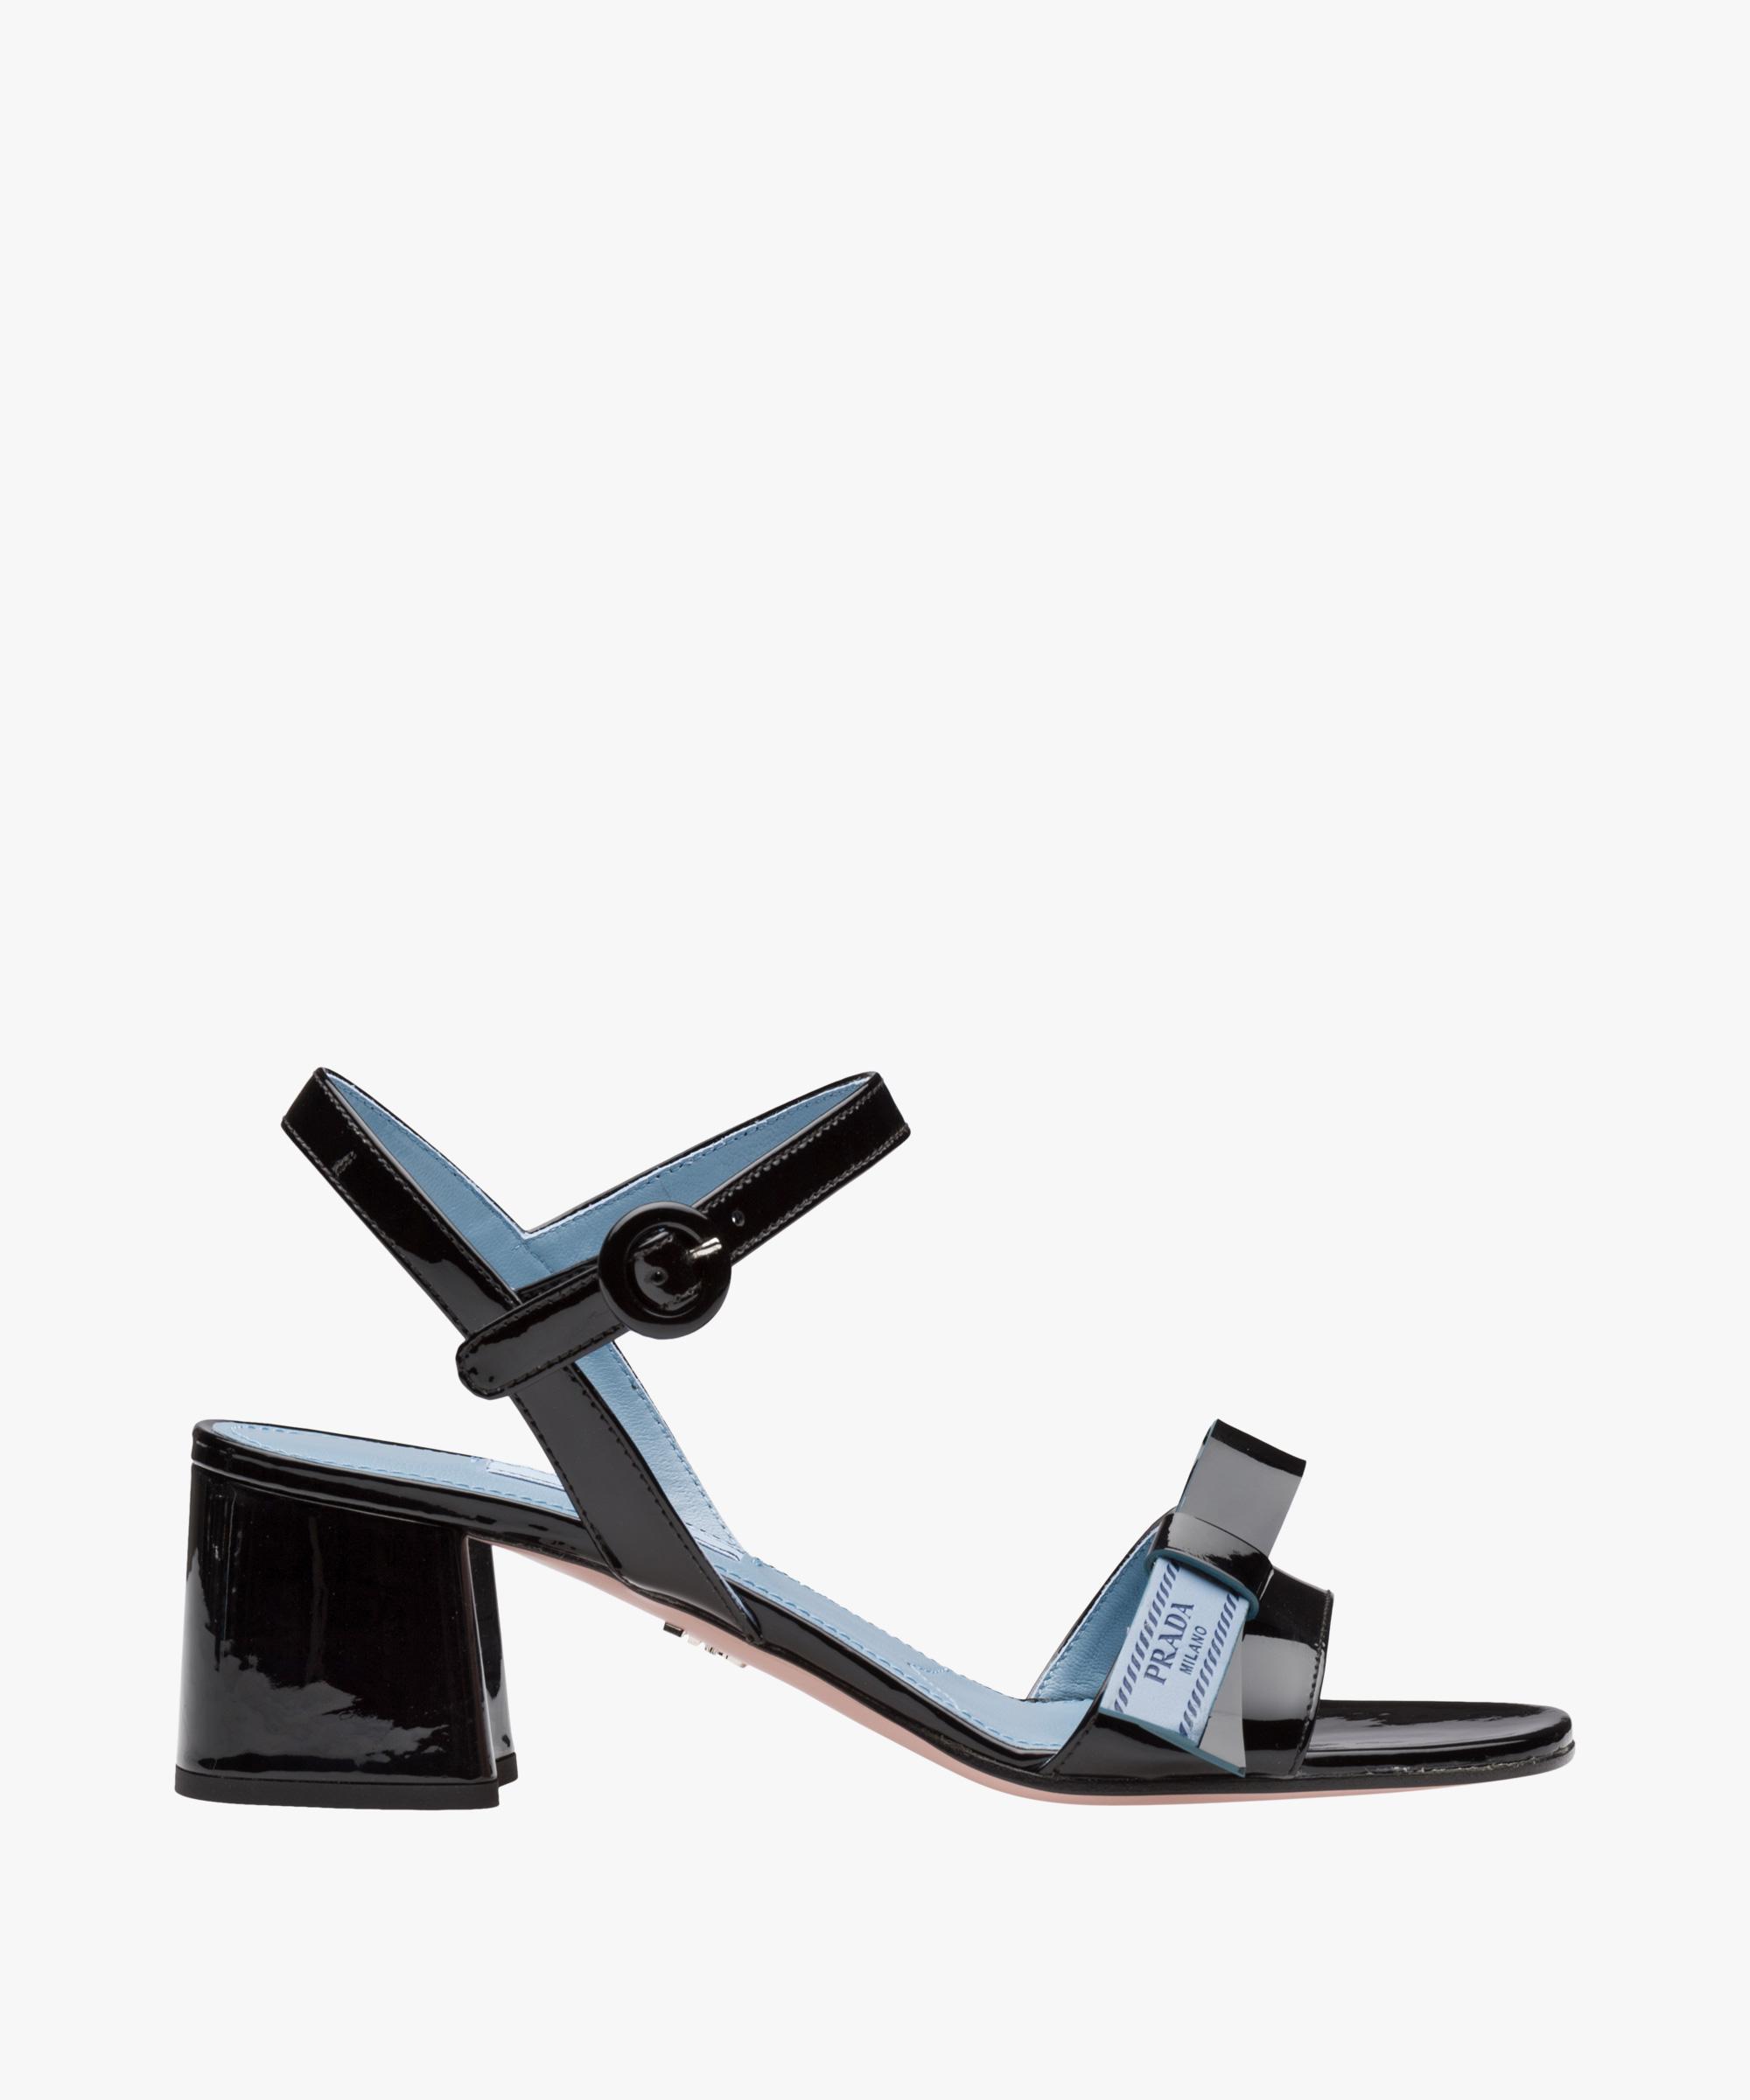 Etiquette sandals - Black Prada 7YjfYpb